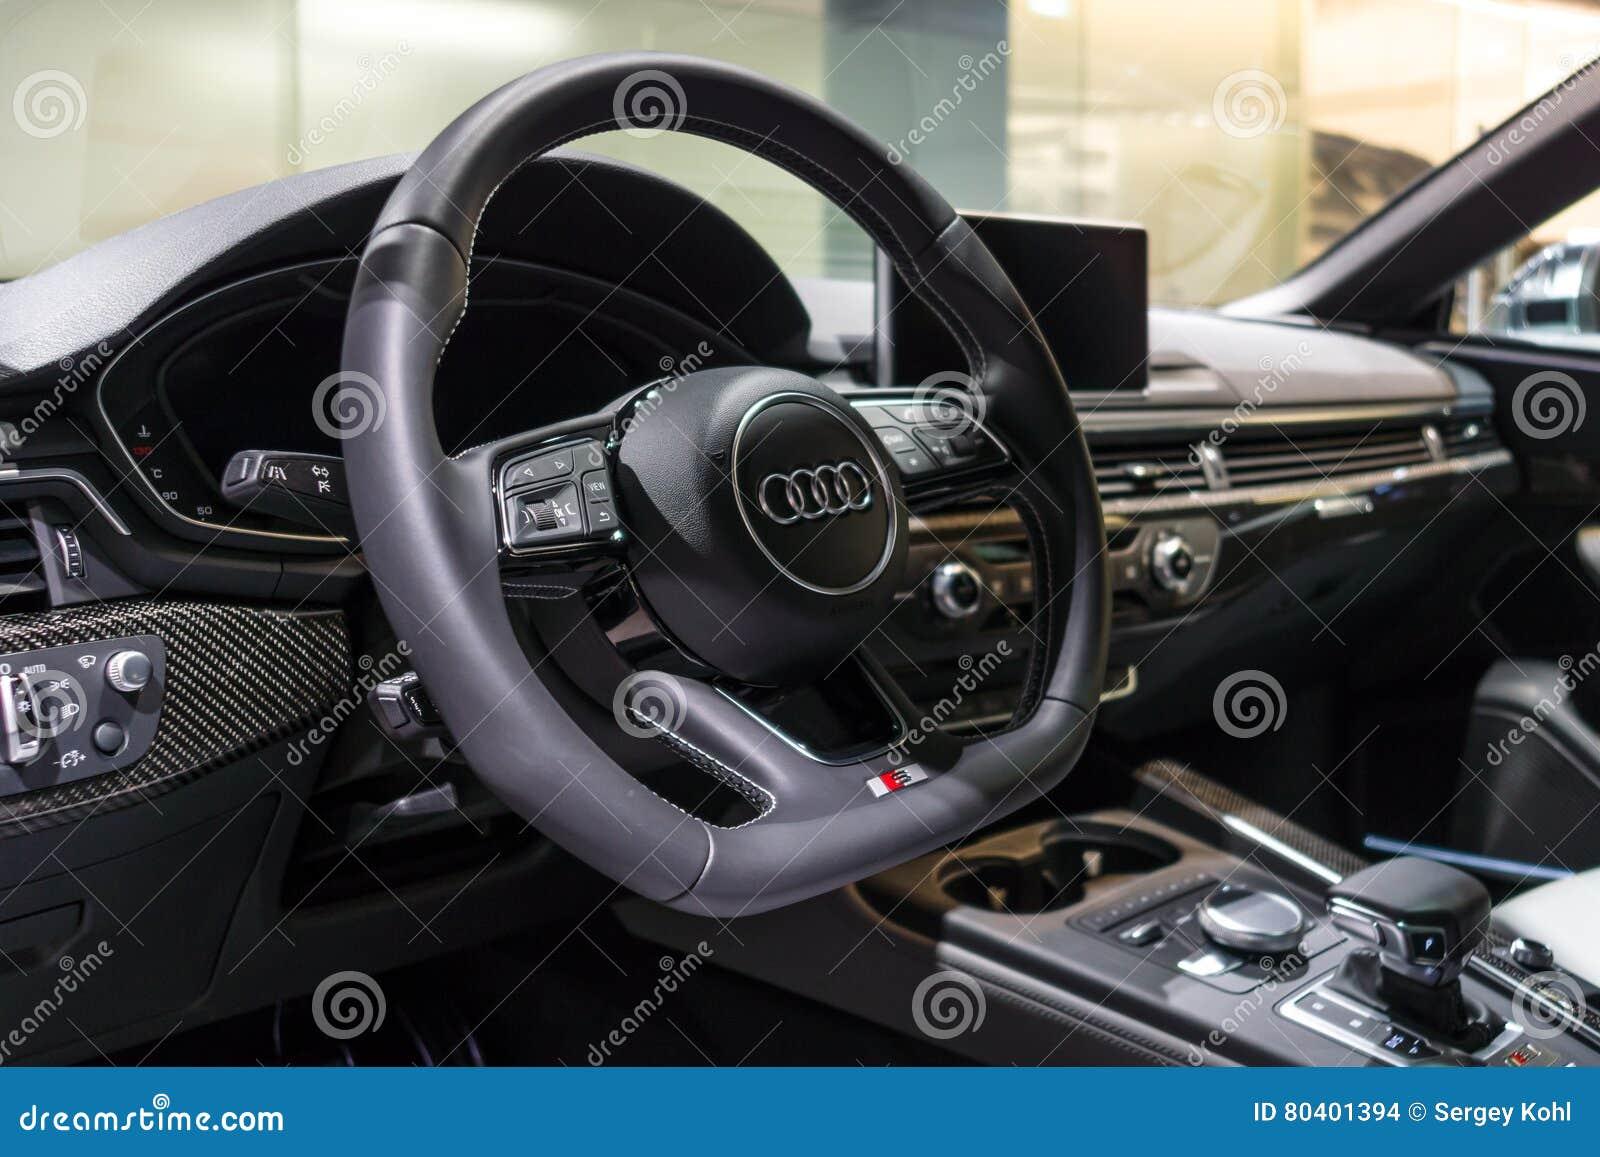 Armaturenbrett audi  Der Armaturenbrett Des Kompakten Exekutivautos Audi S5 Sportback 3 0 ...